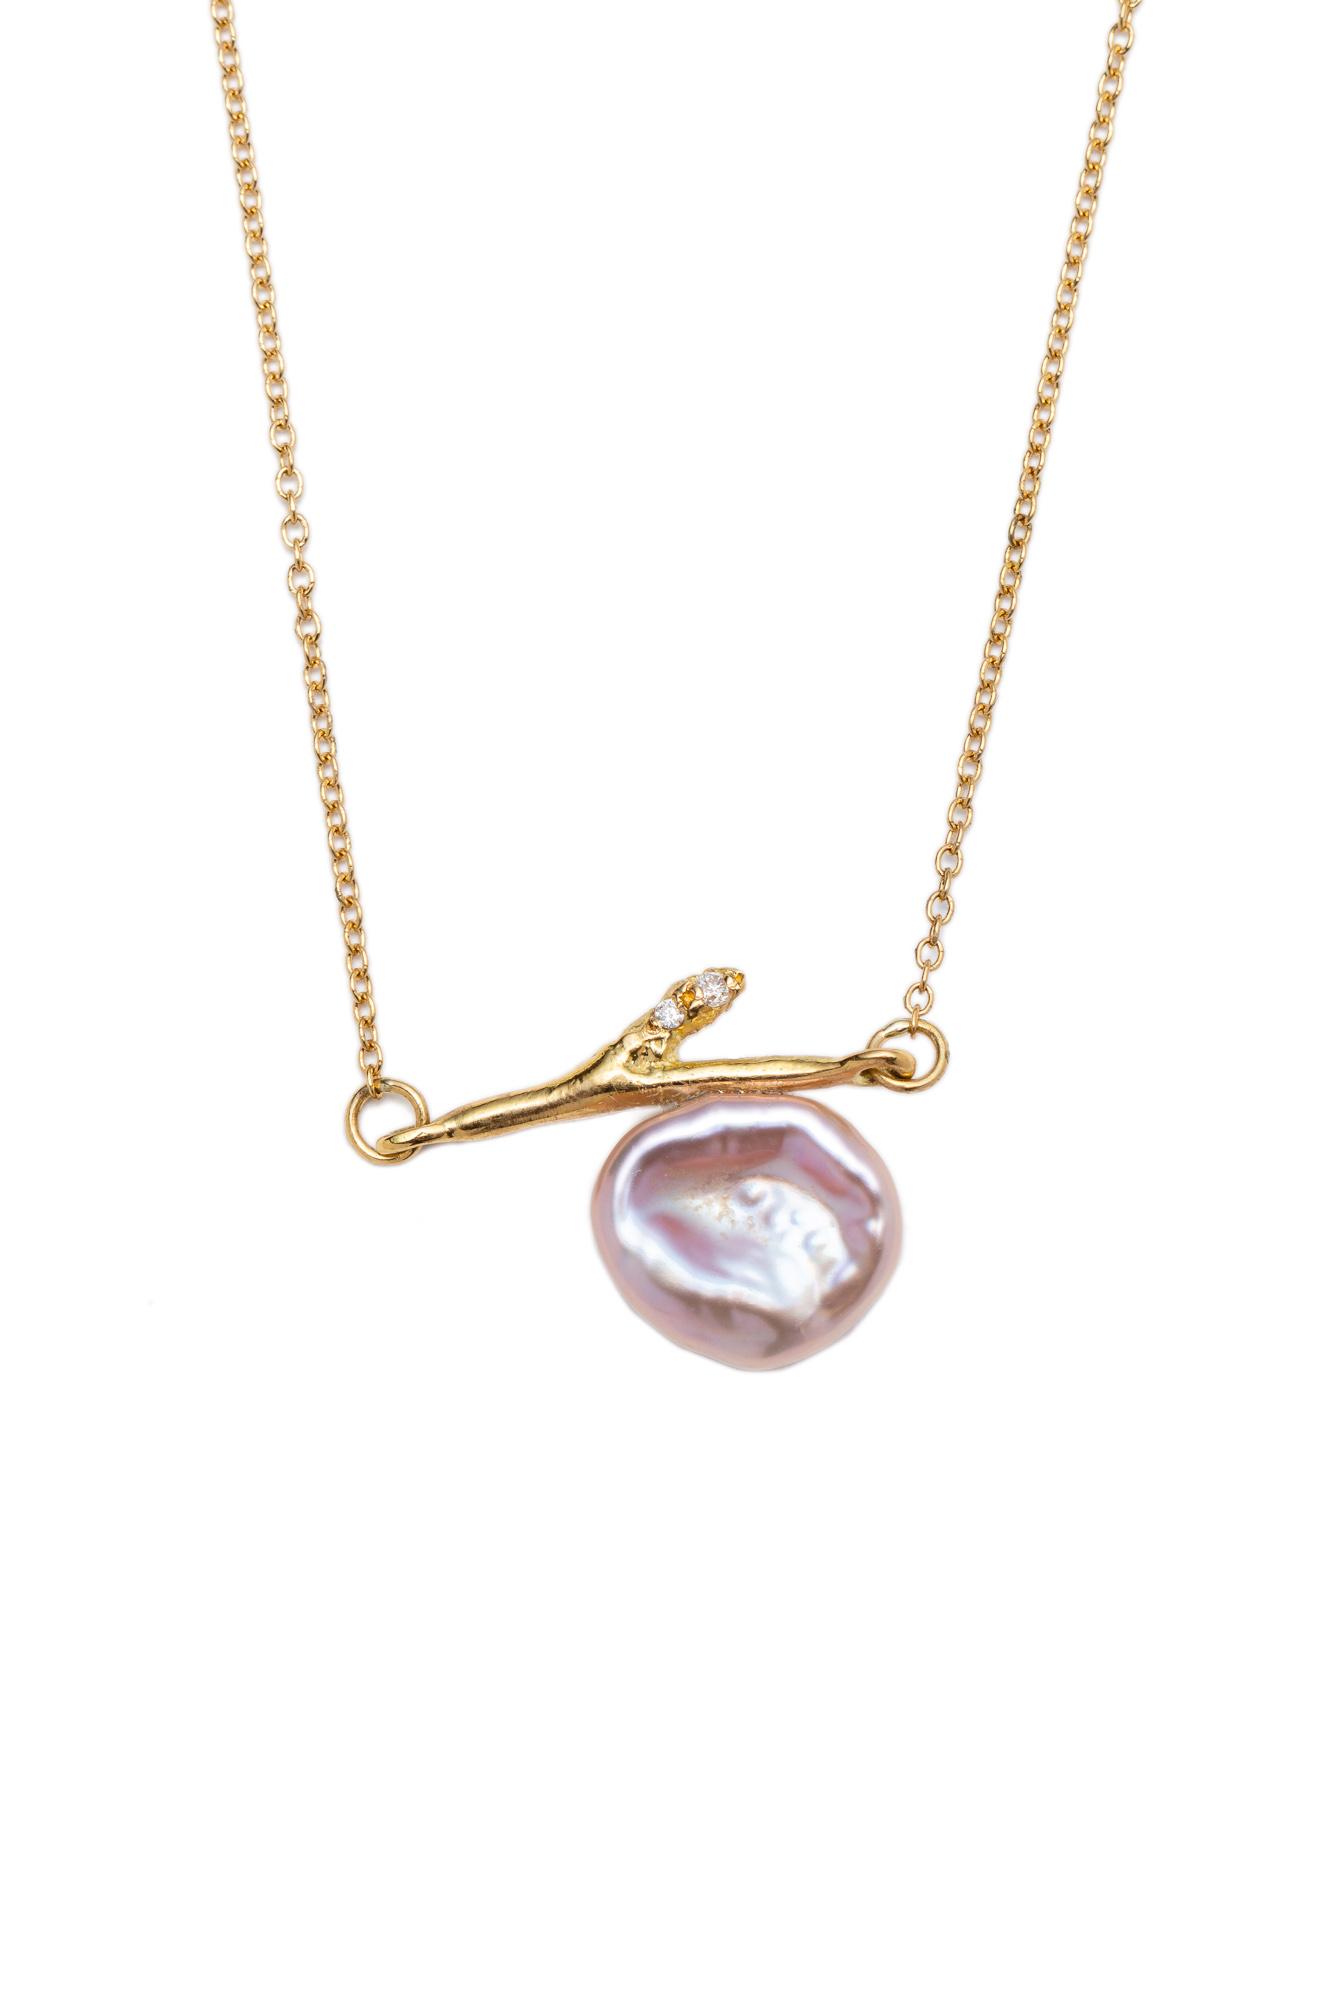 2019-08-05 Jewelry00019-Edit.jpg